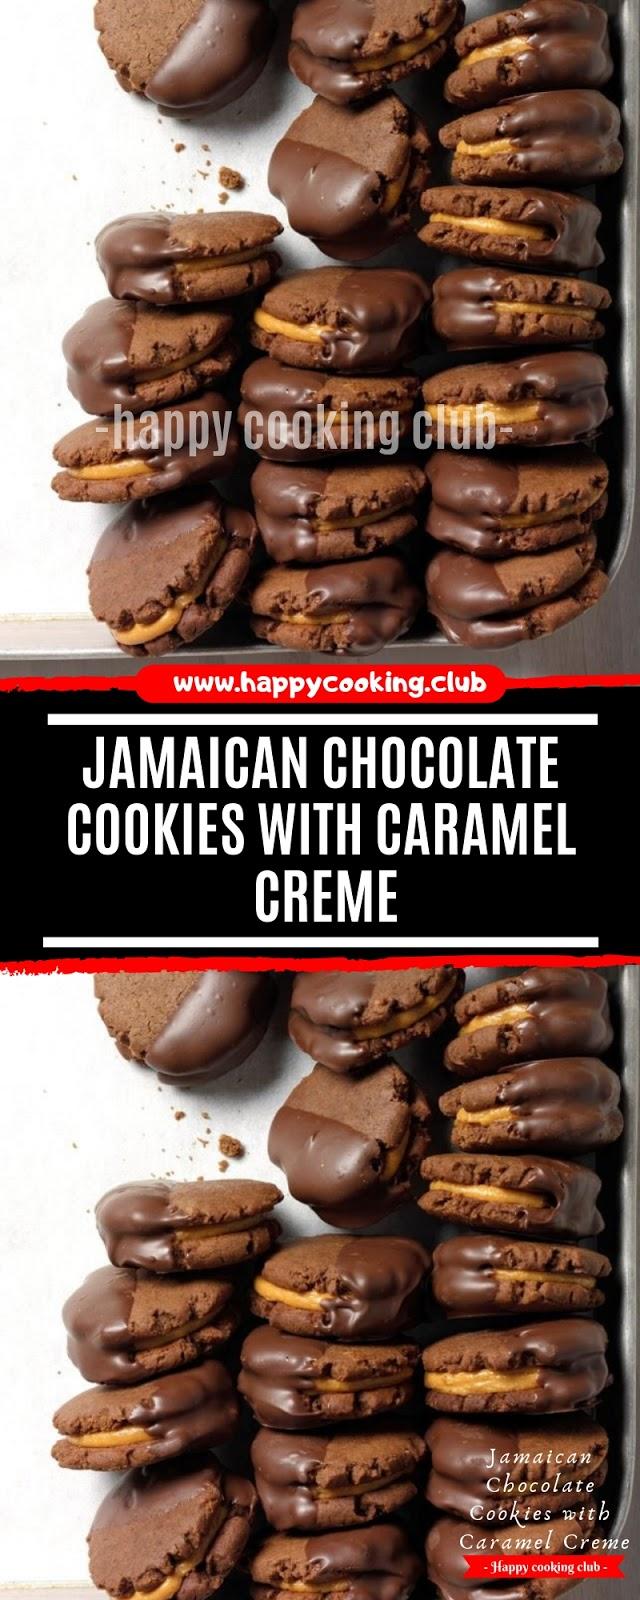 Jamaican Chocolate Cookies with Caramel Creme